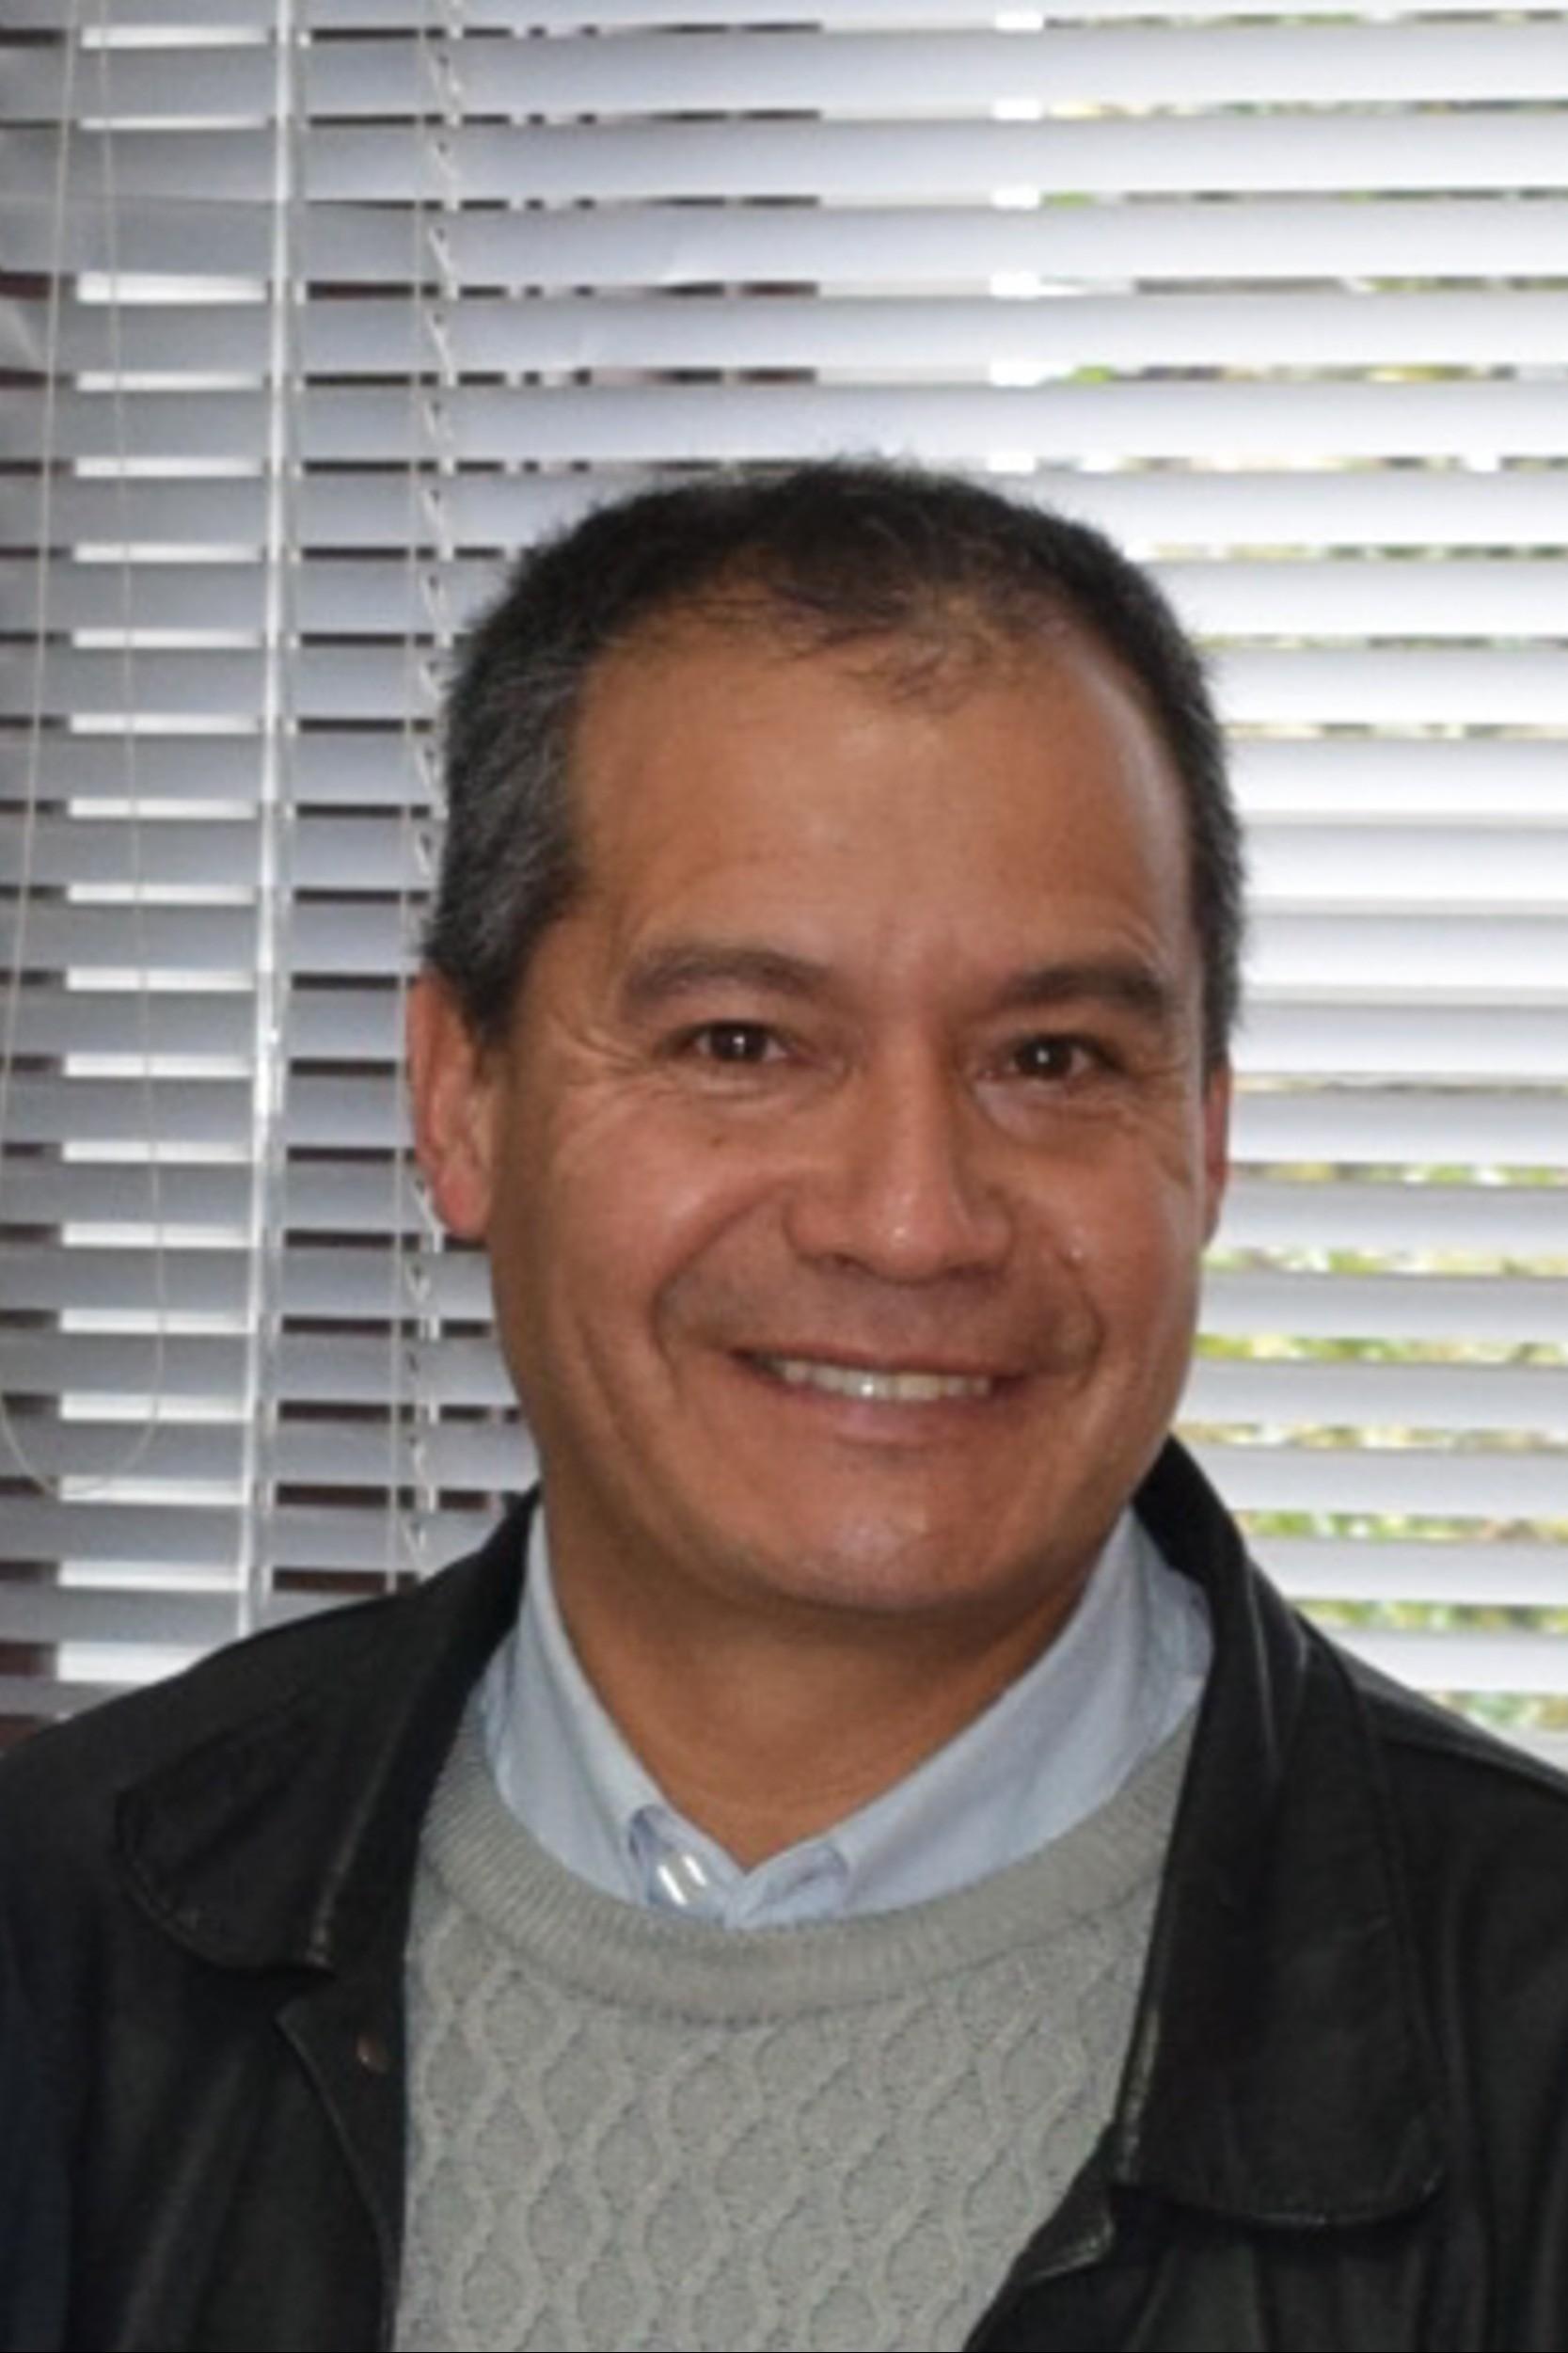 Foto de perfil - Oraci de Freitas